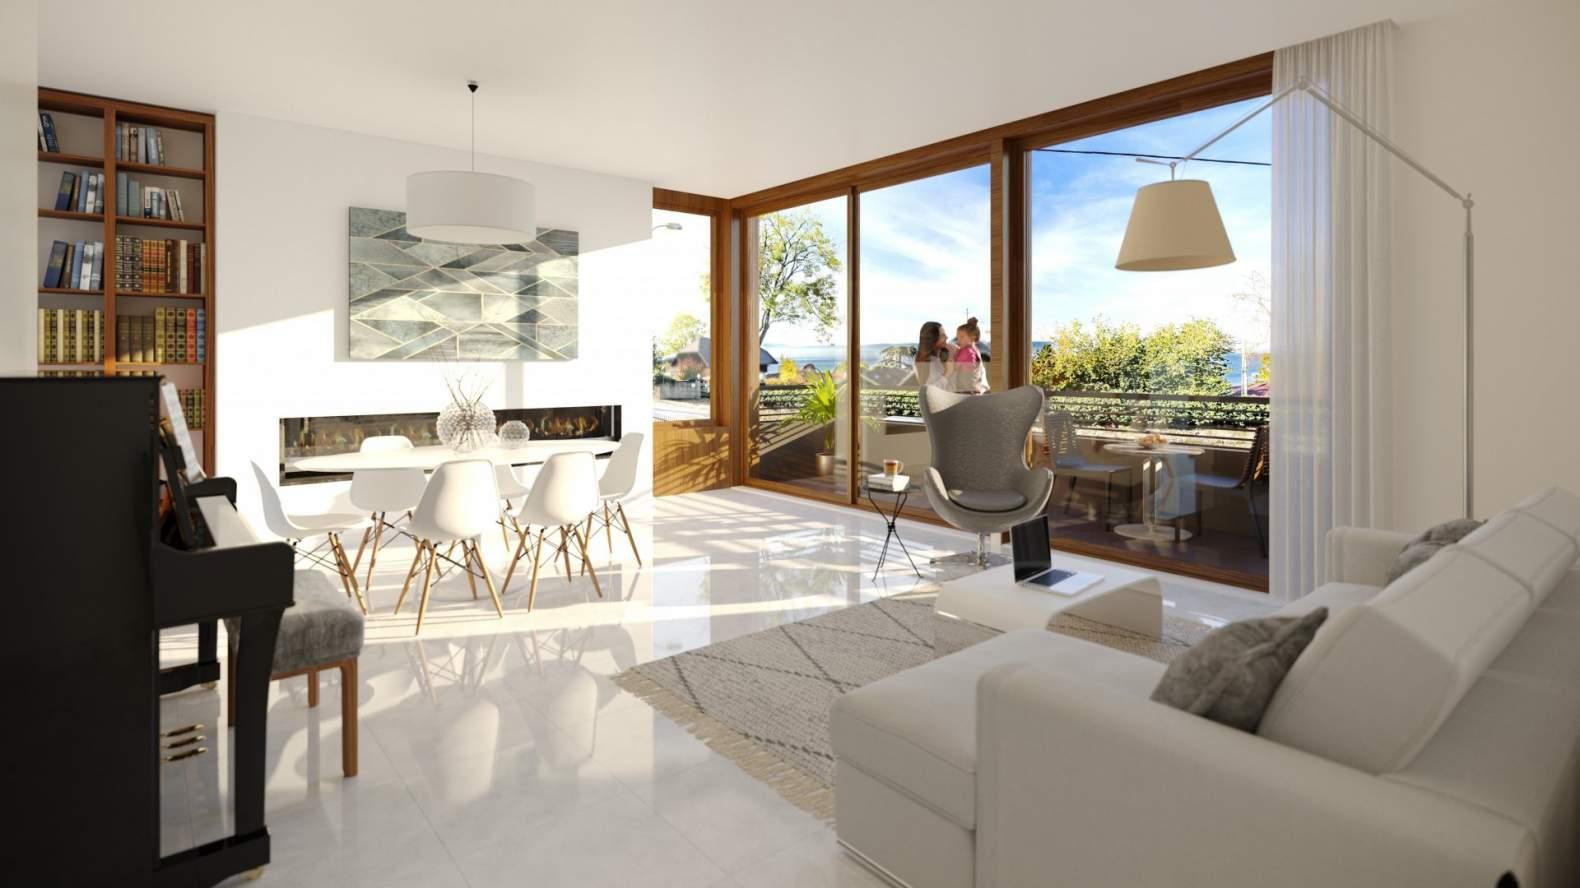 Thonon-les-Bains  - Casa 7 Cuartos 6 Habitaciones - picture 4